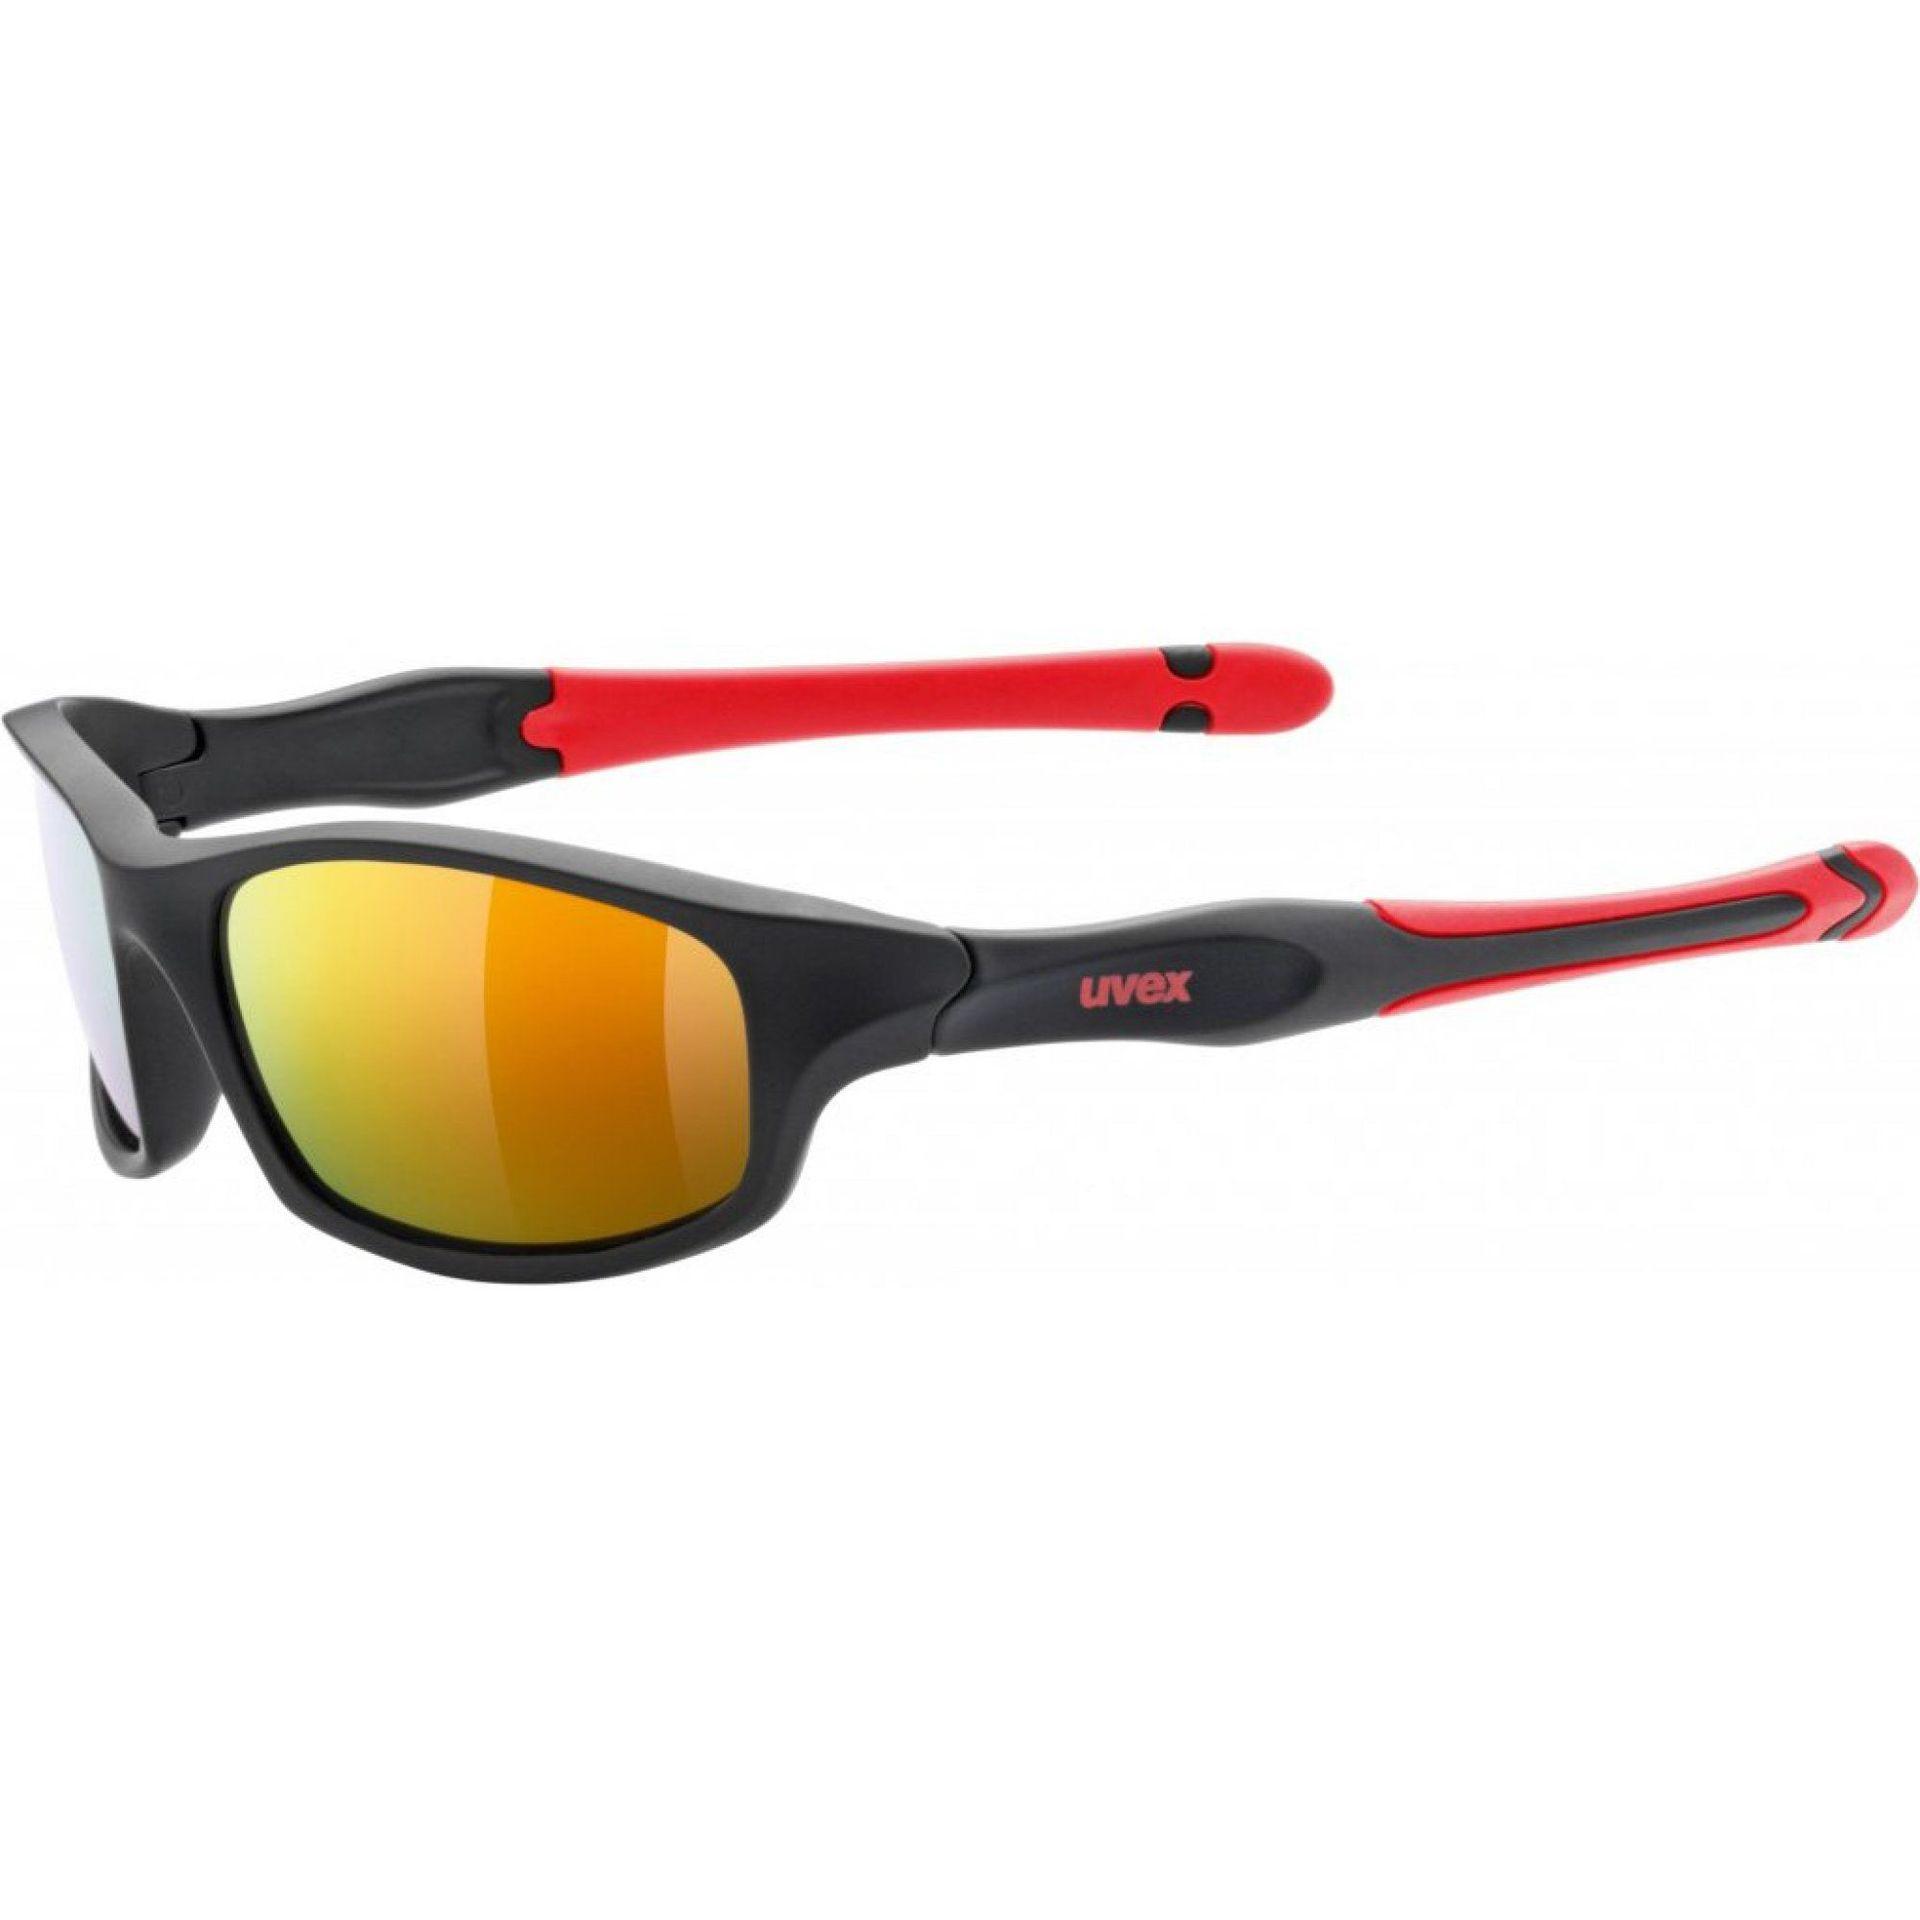 OKULARY UVEX SPORTSTYLE 507 BLACK MAT RED